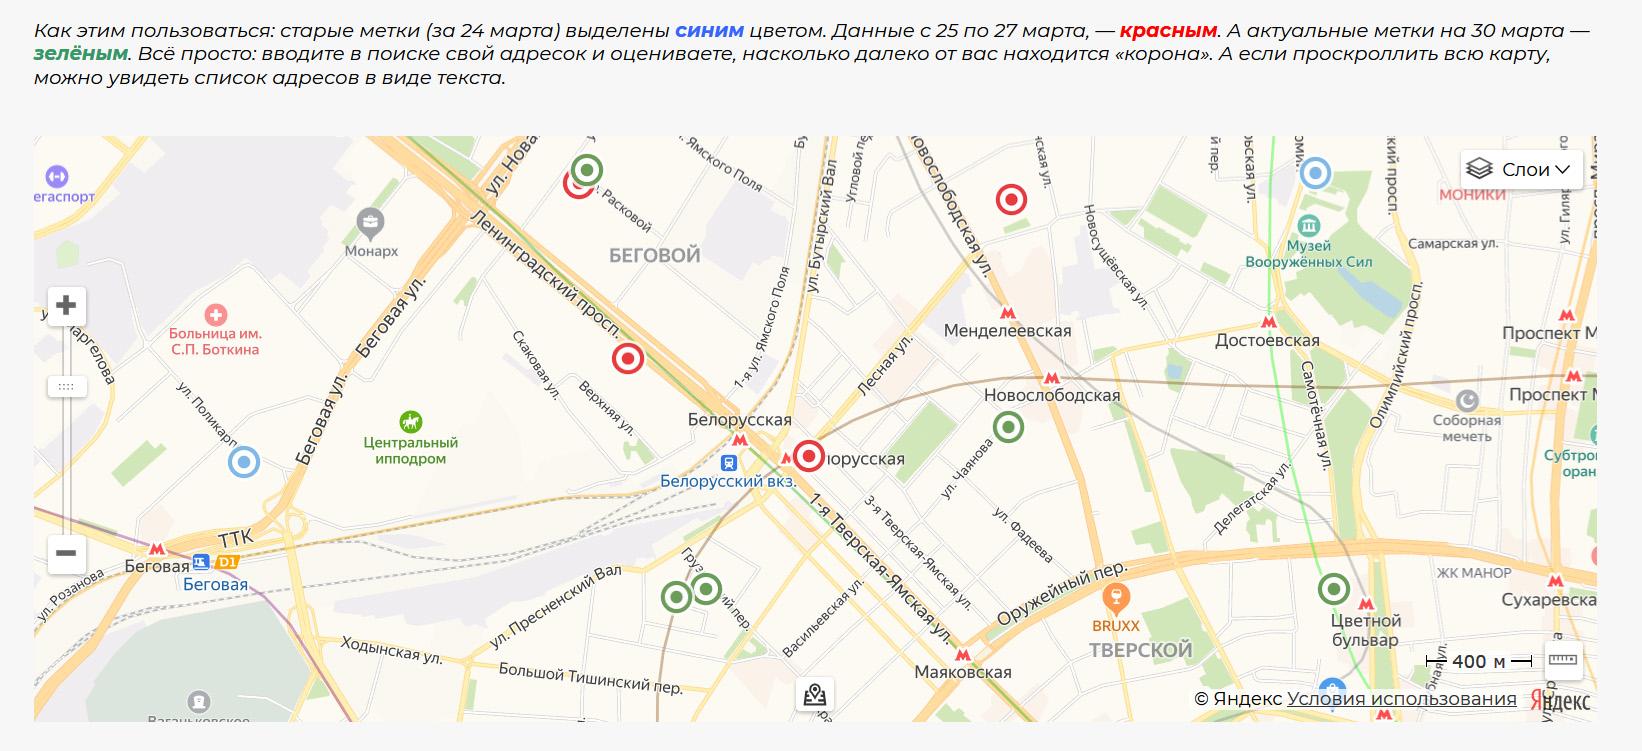 Откуда в Москве забирали с диагнозом короновирус